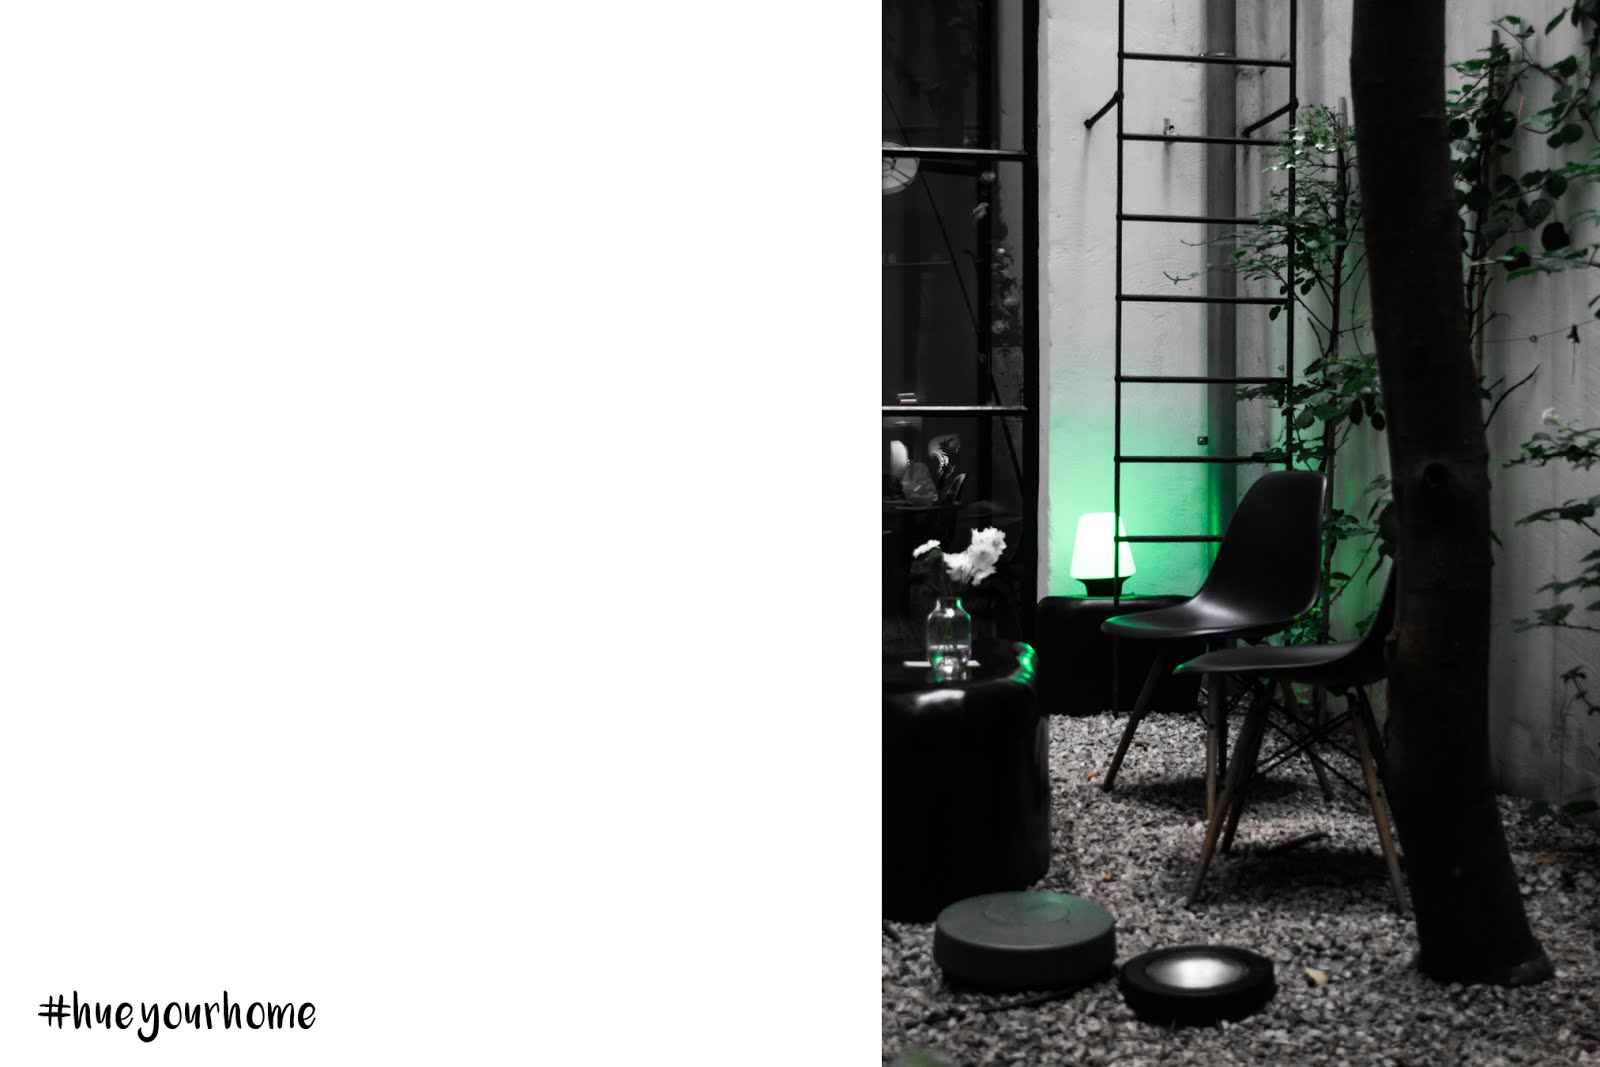 Philips hue, wireless light, wellbeing, event, hotel julien antwerp, hotelroom